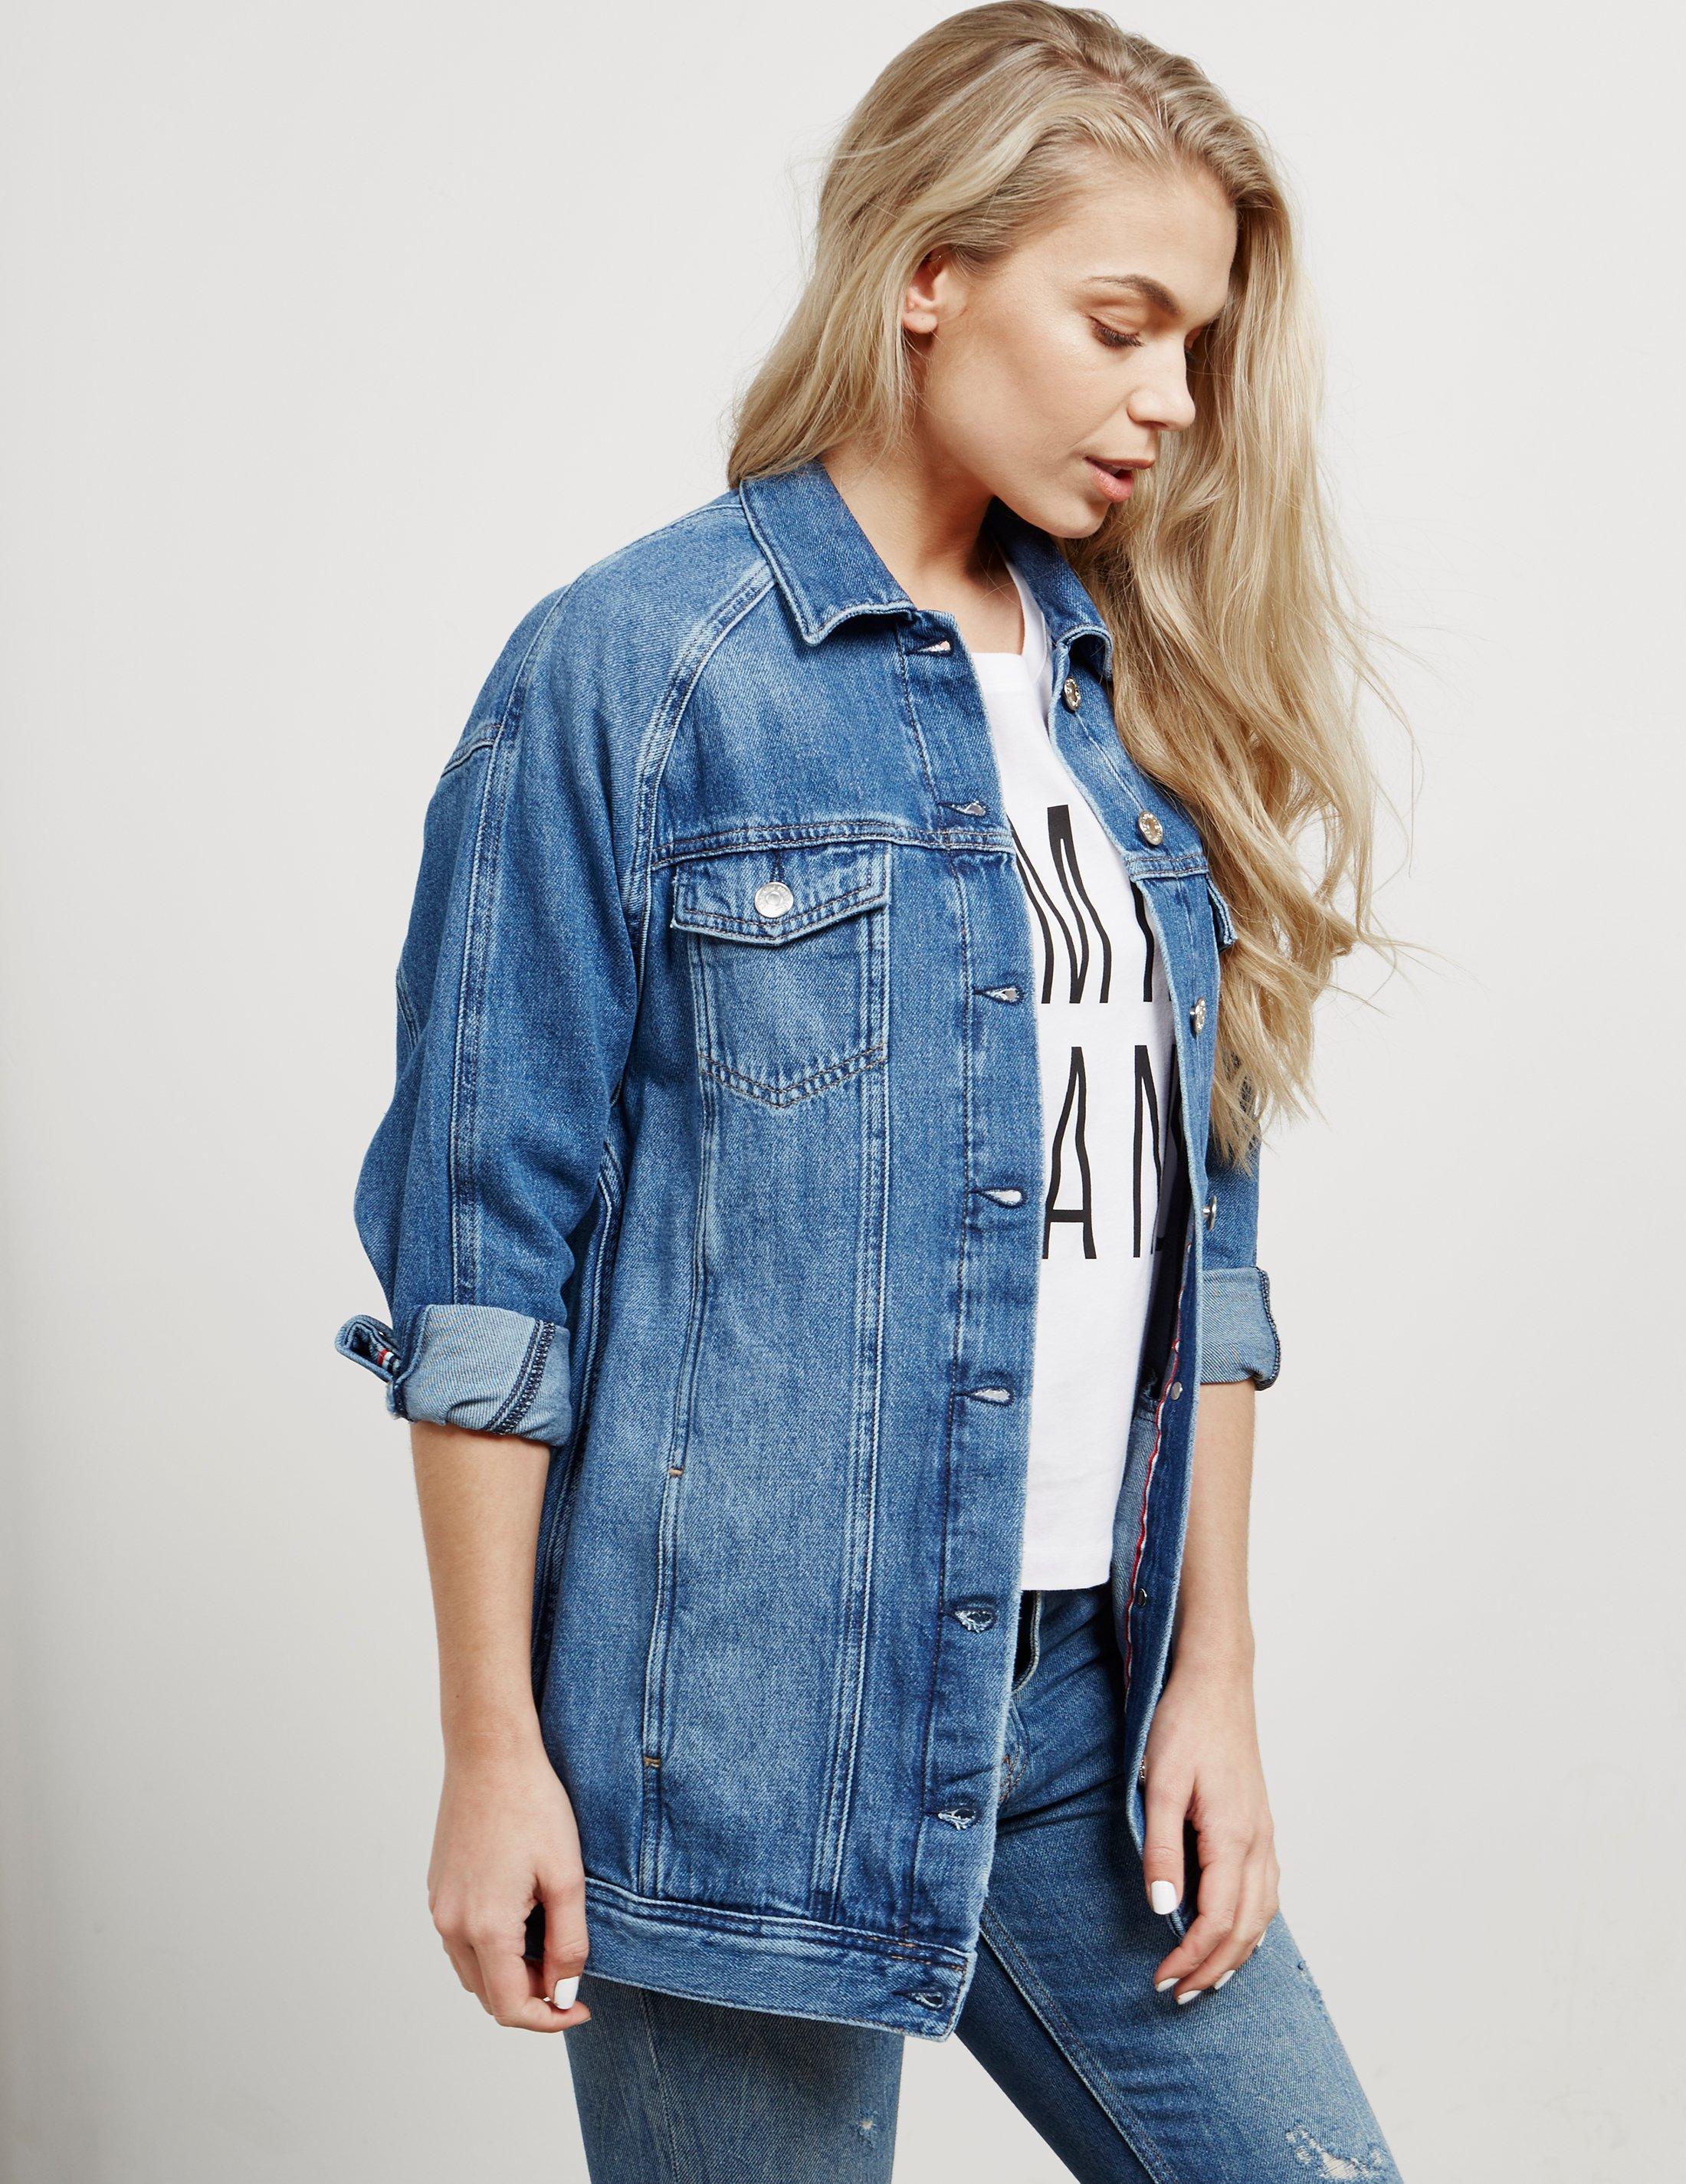 NWT Women/'s Tommy Hilfiger Long Sleeve Jeans Denim Jacket